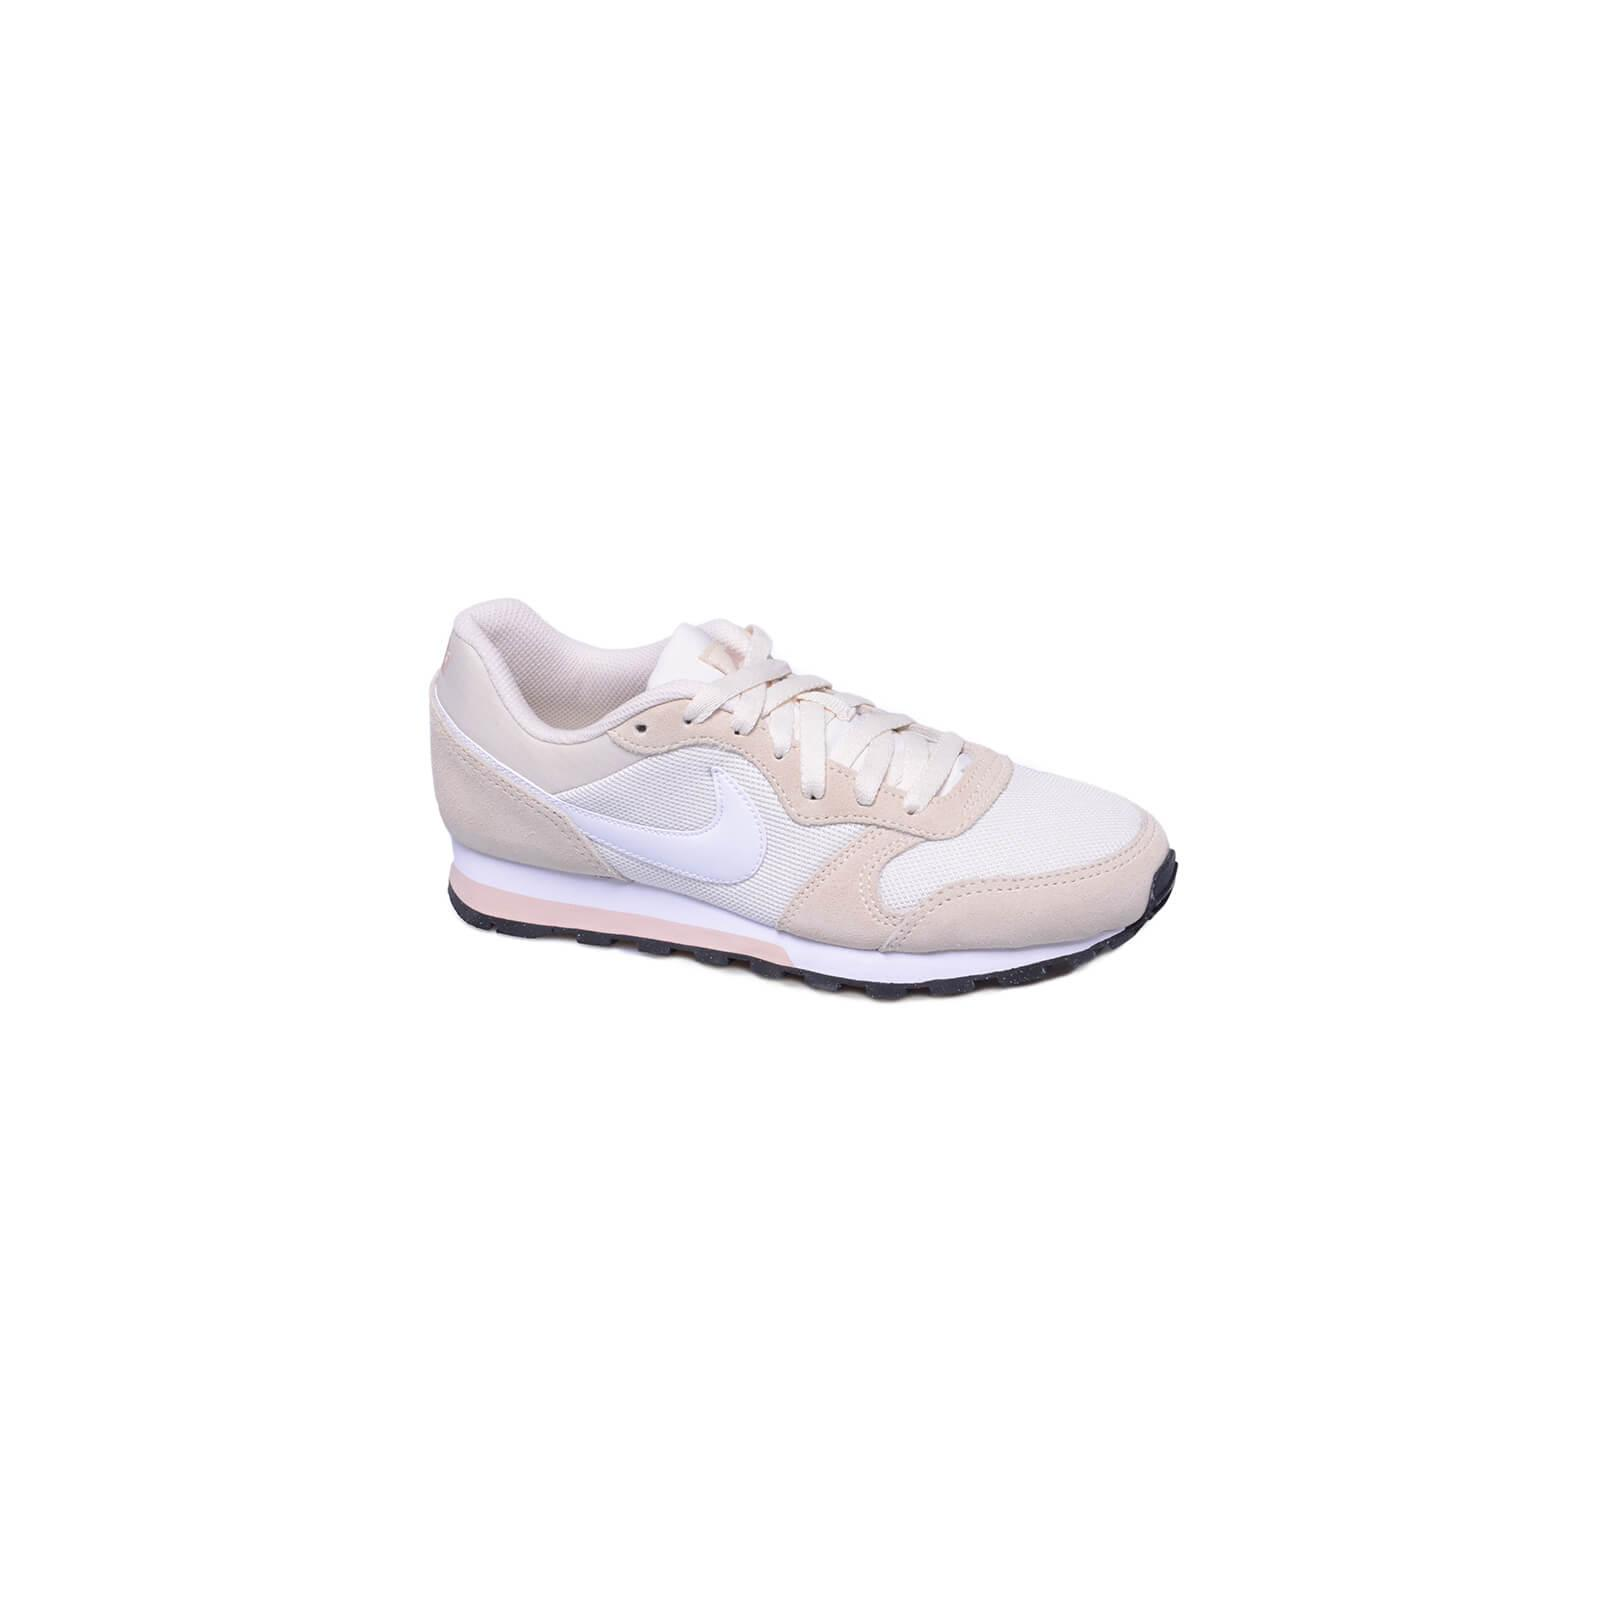 Tênis Nike Md Runner 2 Bege 749869 011 | Omar Calçados